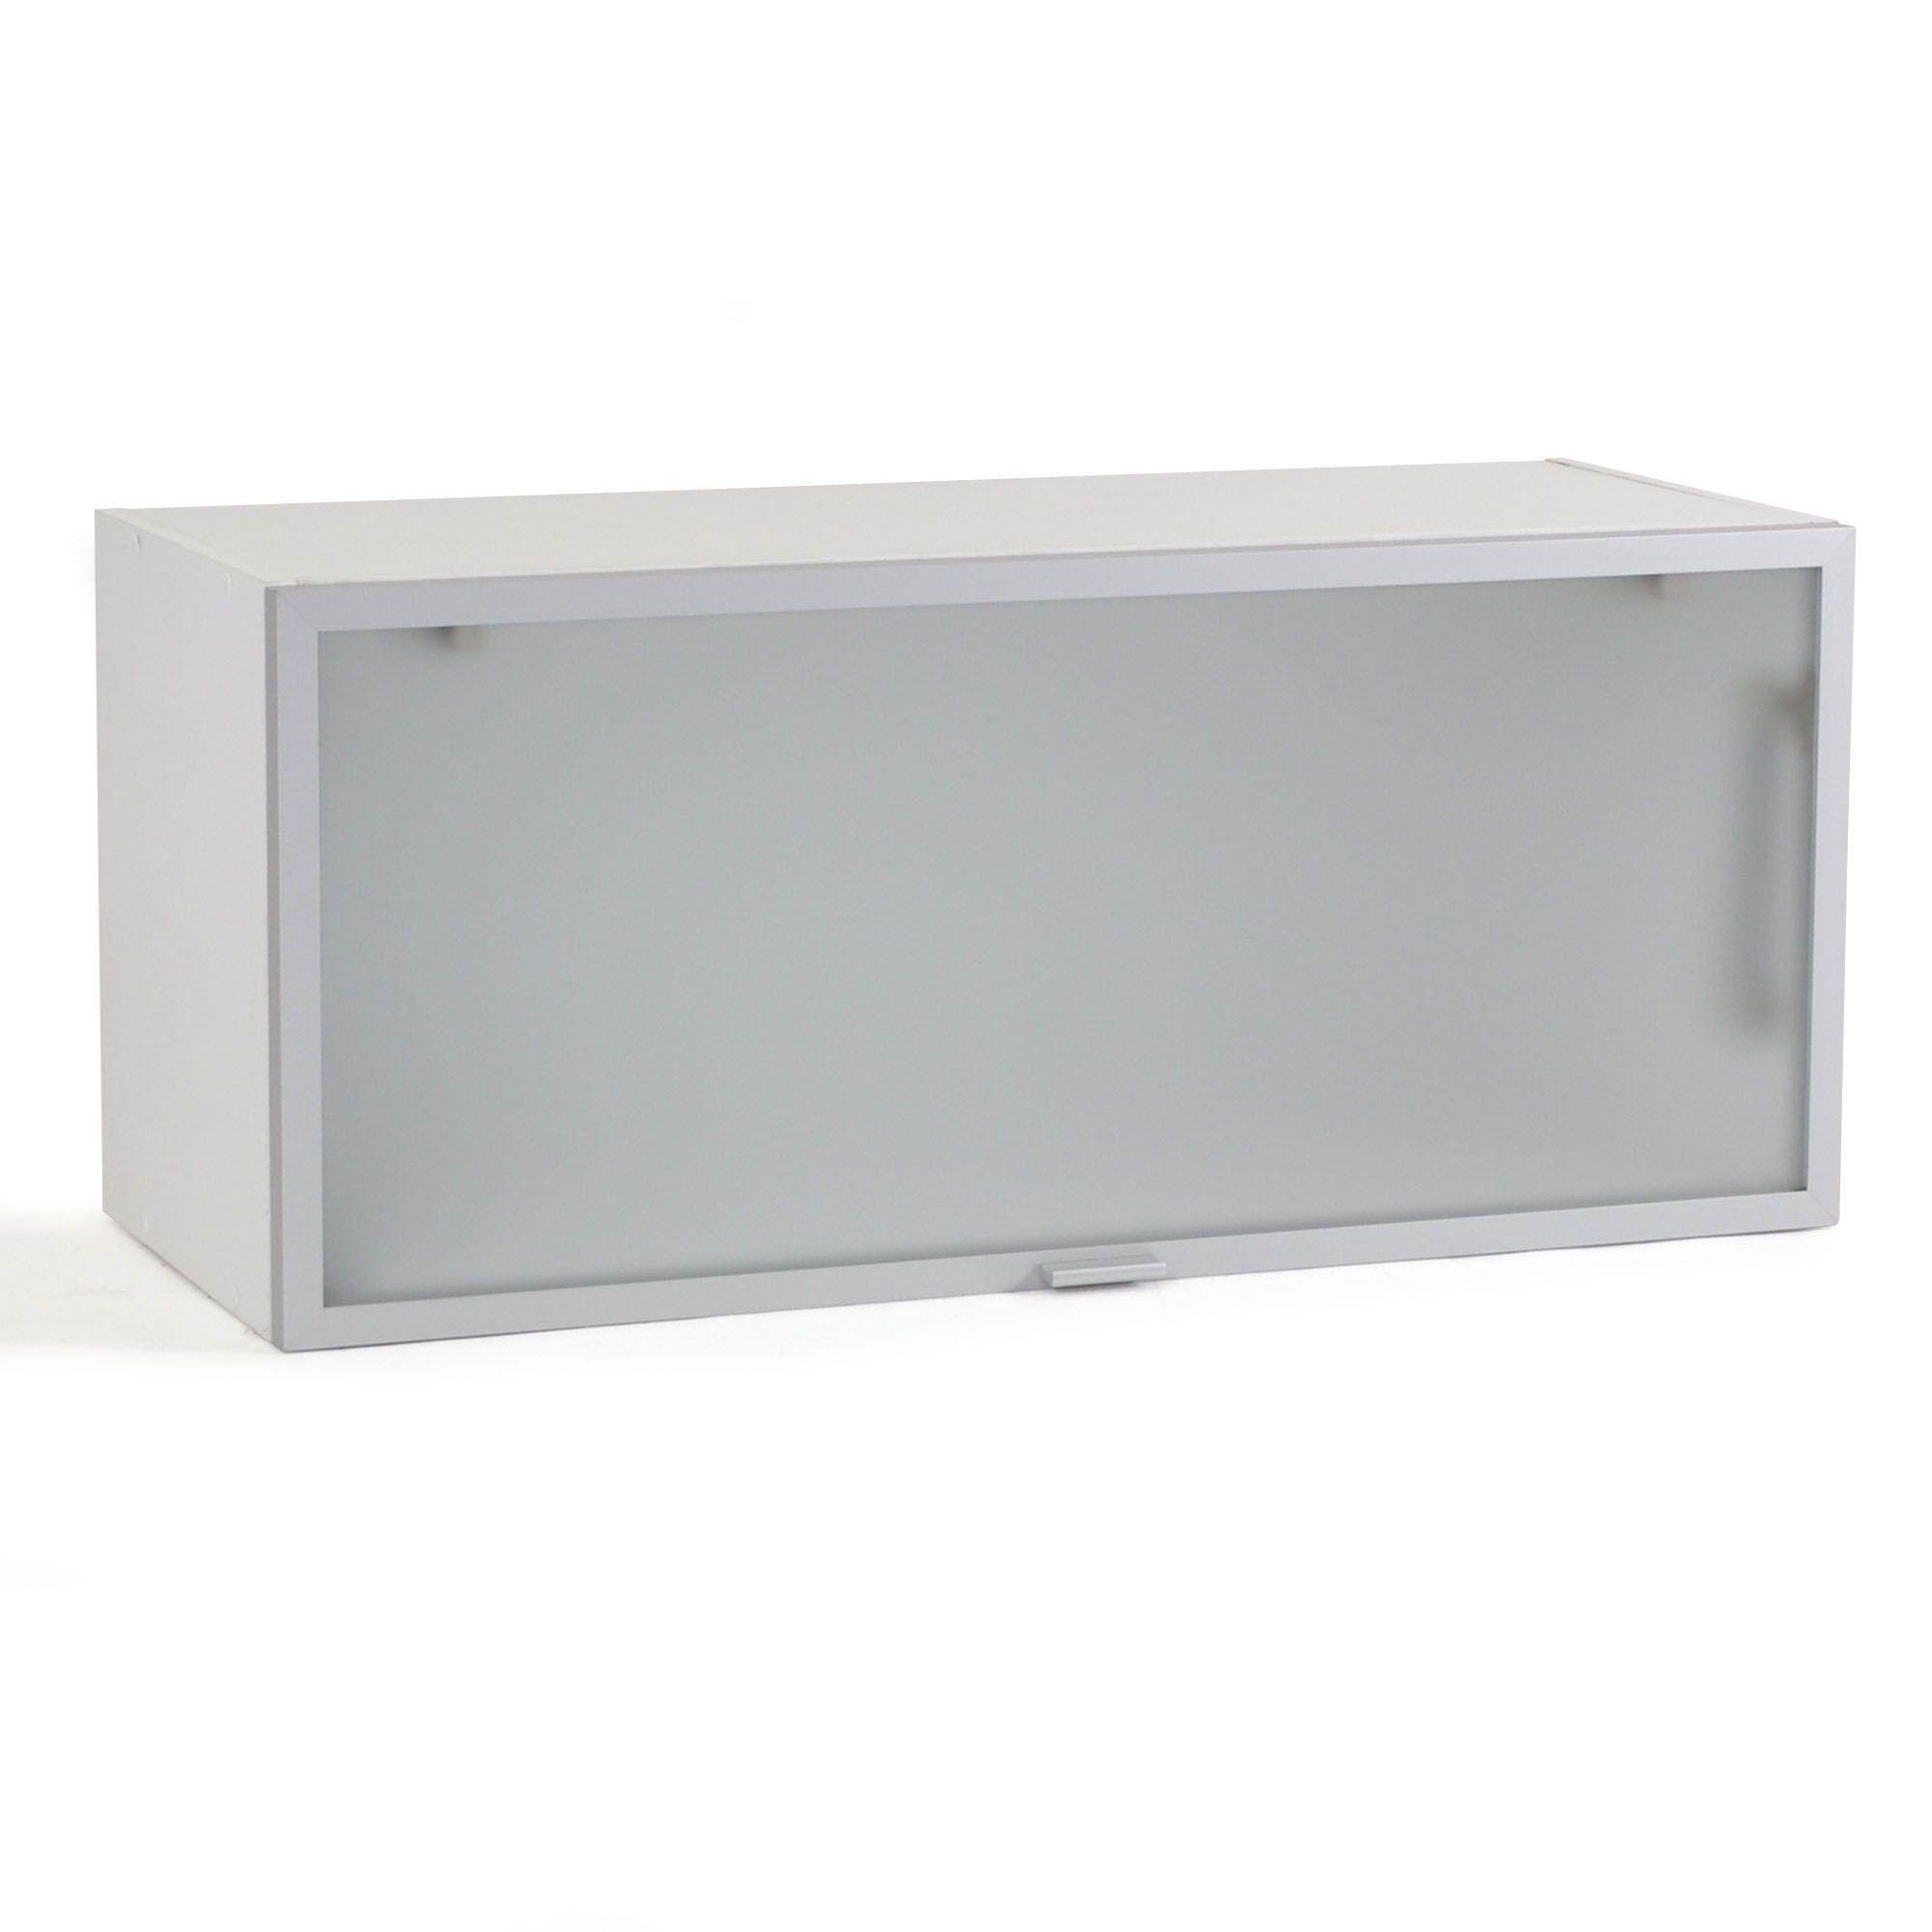 meuble de cuisine haut court porte relevante en verre 80cm alu